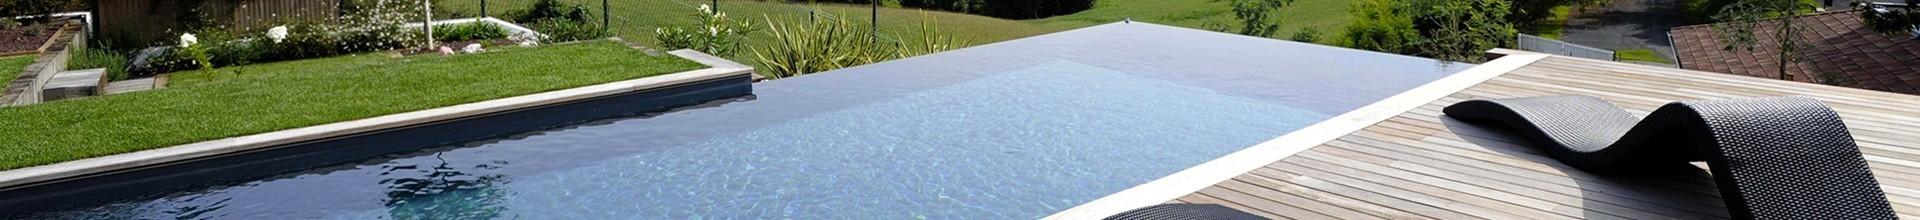 Direct usine, piscine coque prix Aveyron